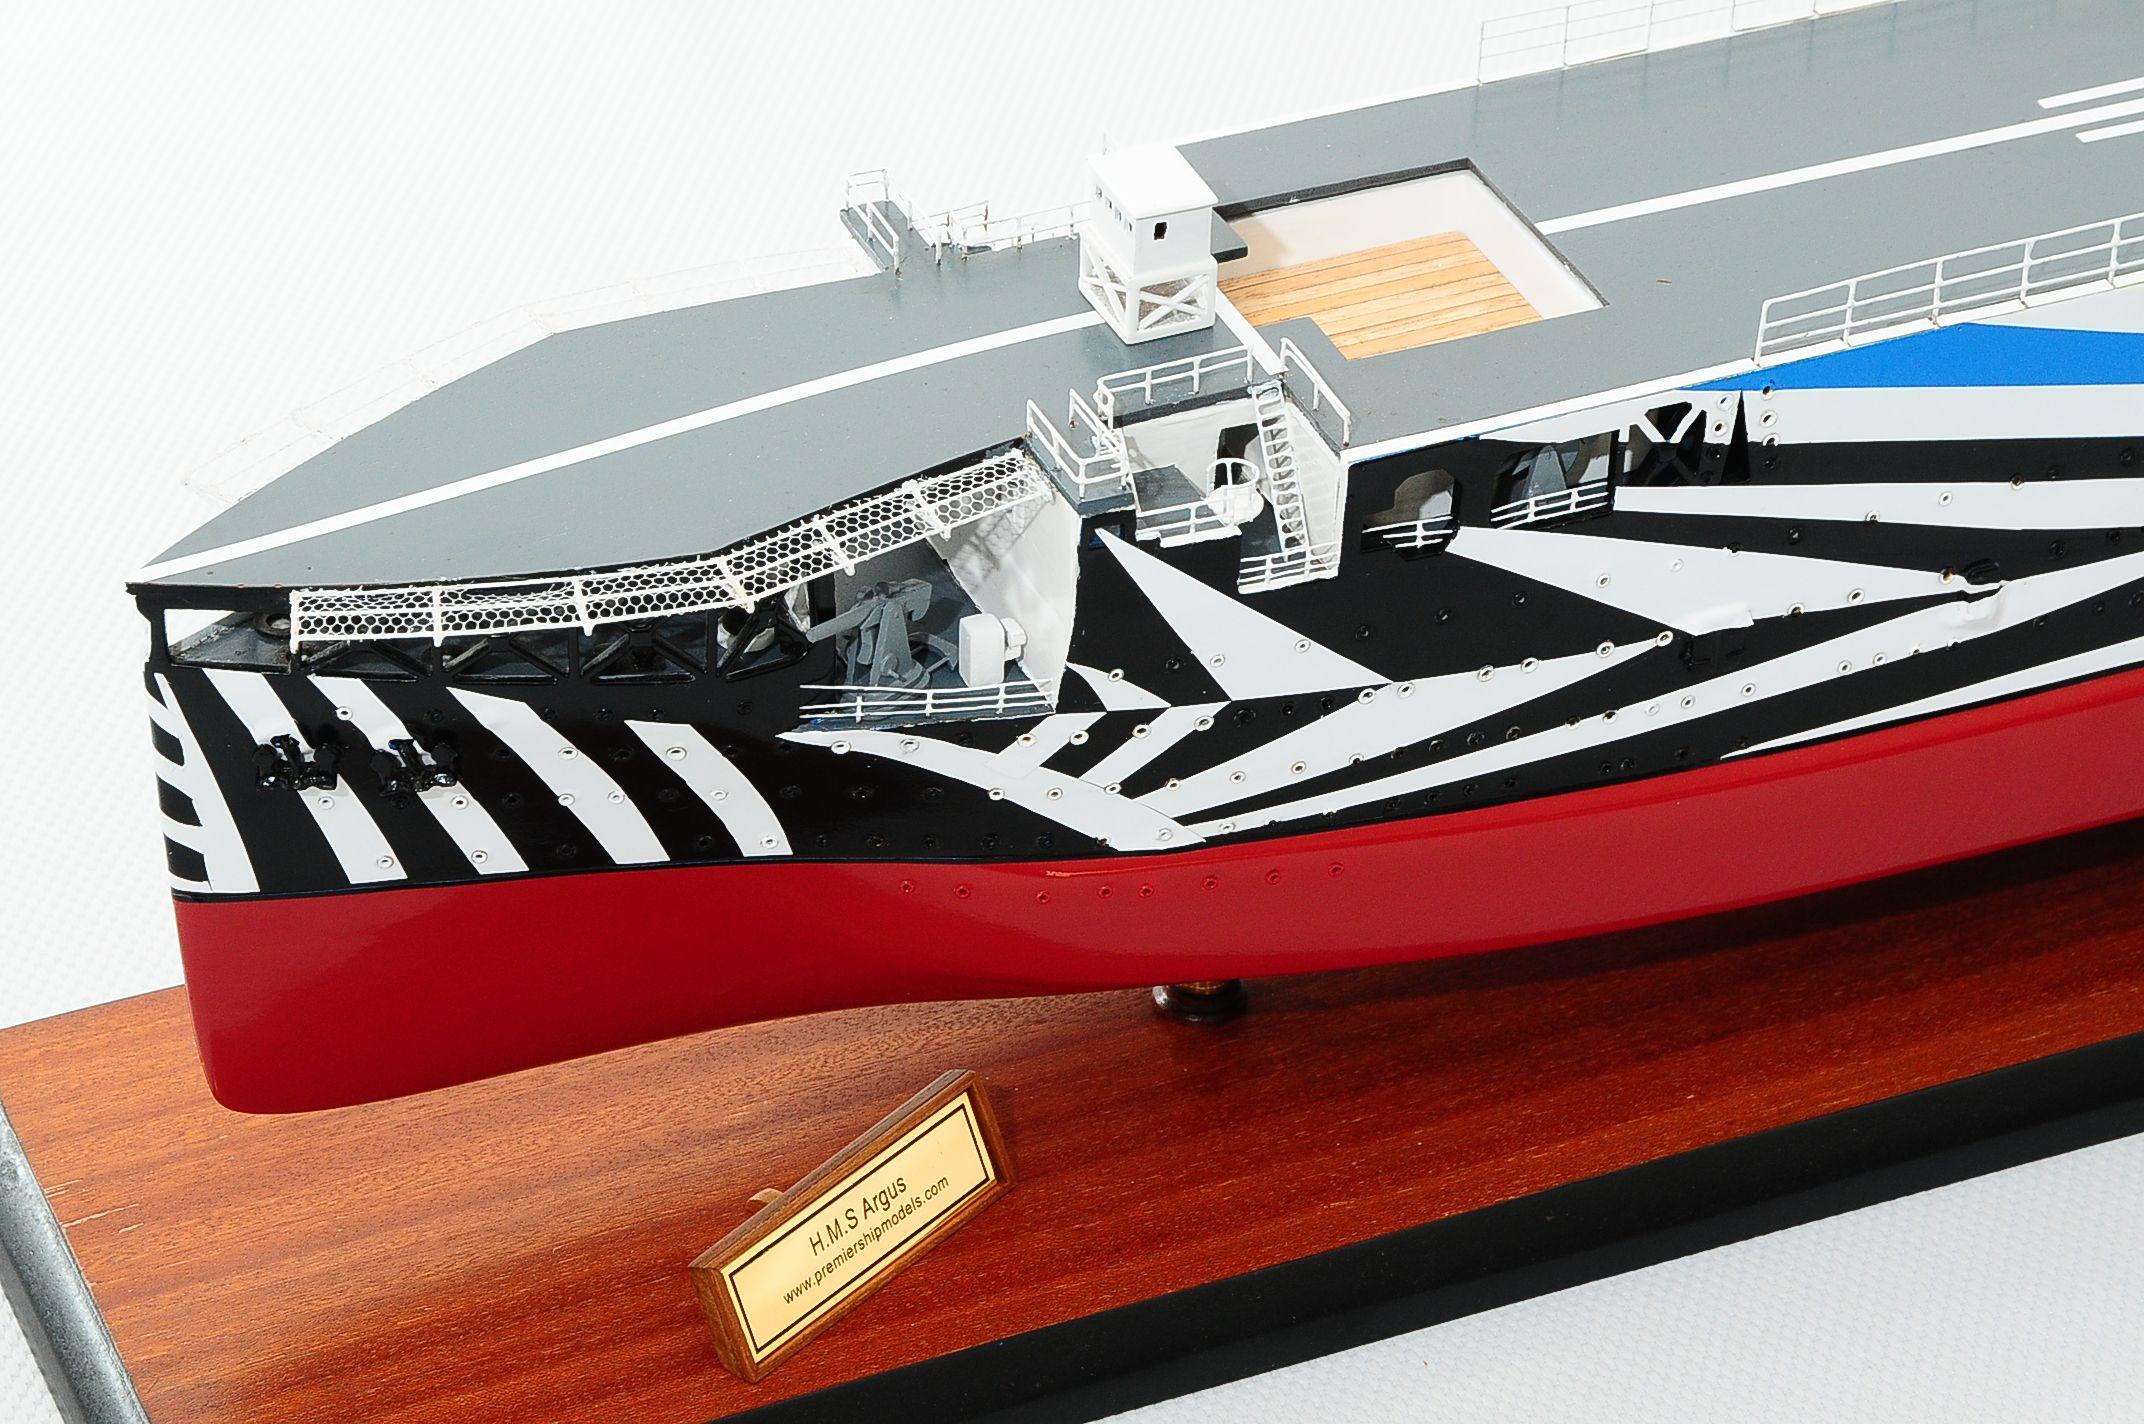 663-6123-HMS-Argus-Model-Boat